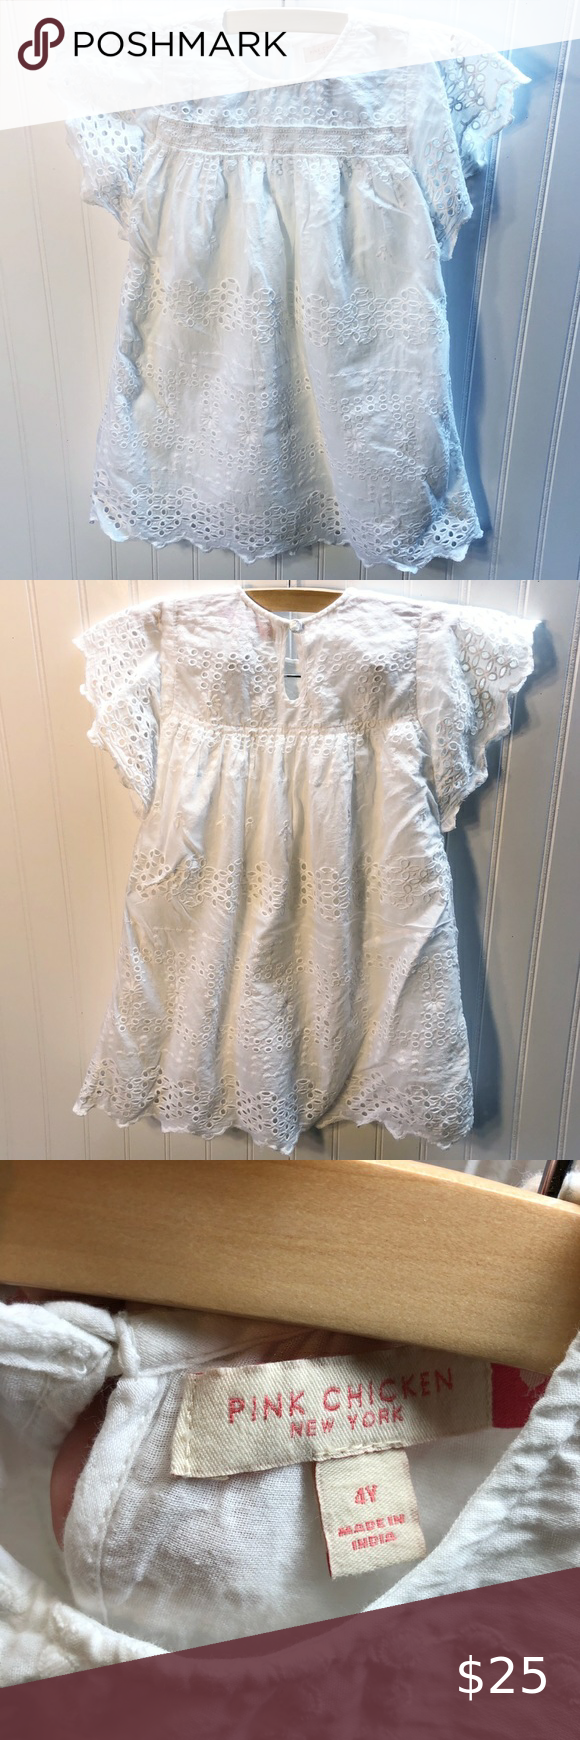 Pink Chicken White Eyelet Dress Girls Size 4 White Eyelet Dress Girls Shift Dress White Eyelet [ 1740 x 580 Pixel ]